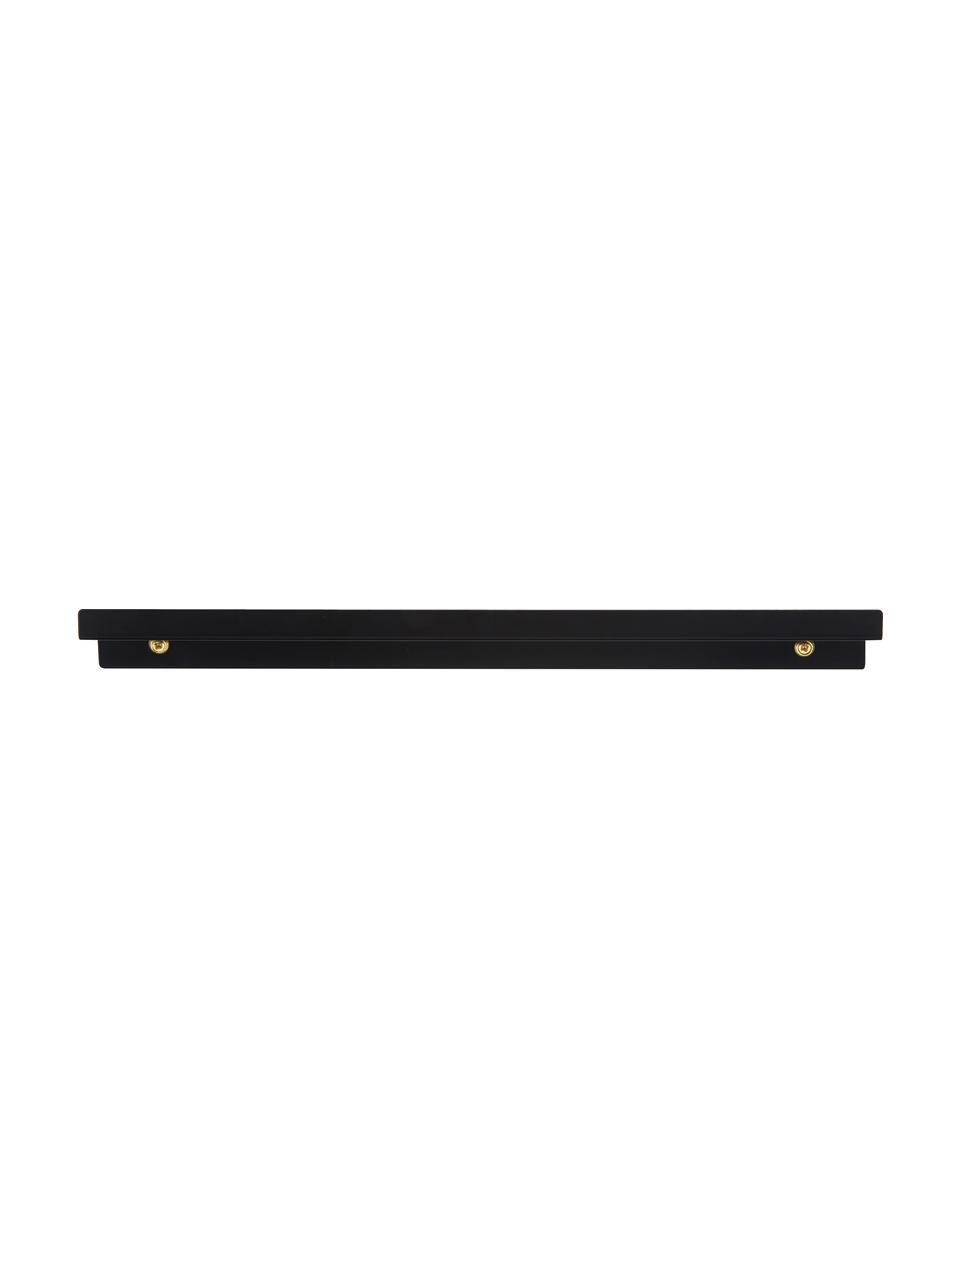 Ripiano nero opaco Shelfini, Asta: metallo verniciato, Nero, ottone, Larg. 50 x Alt. 6 cm